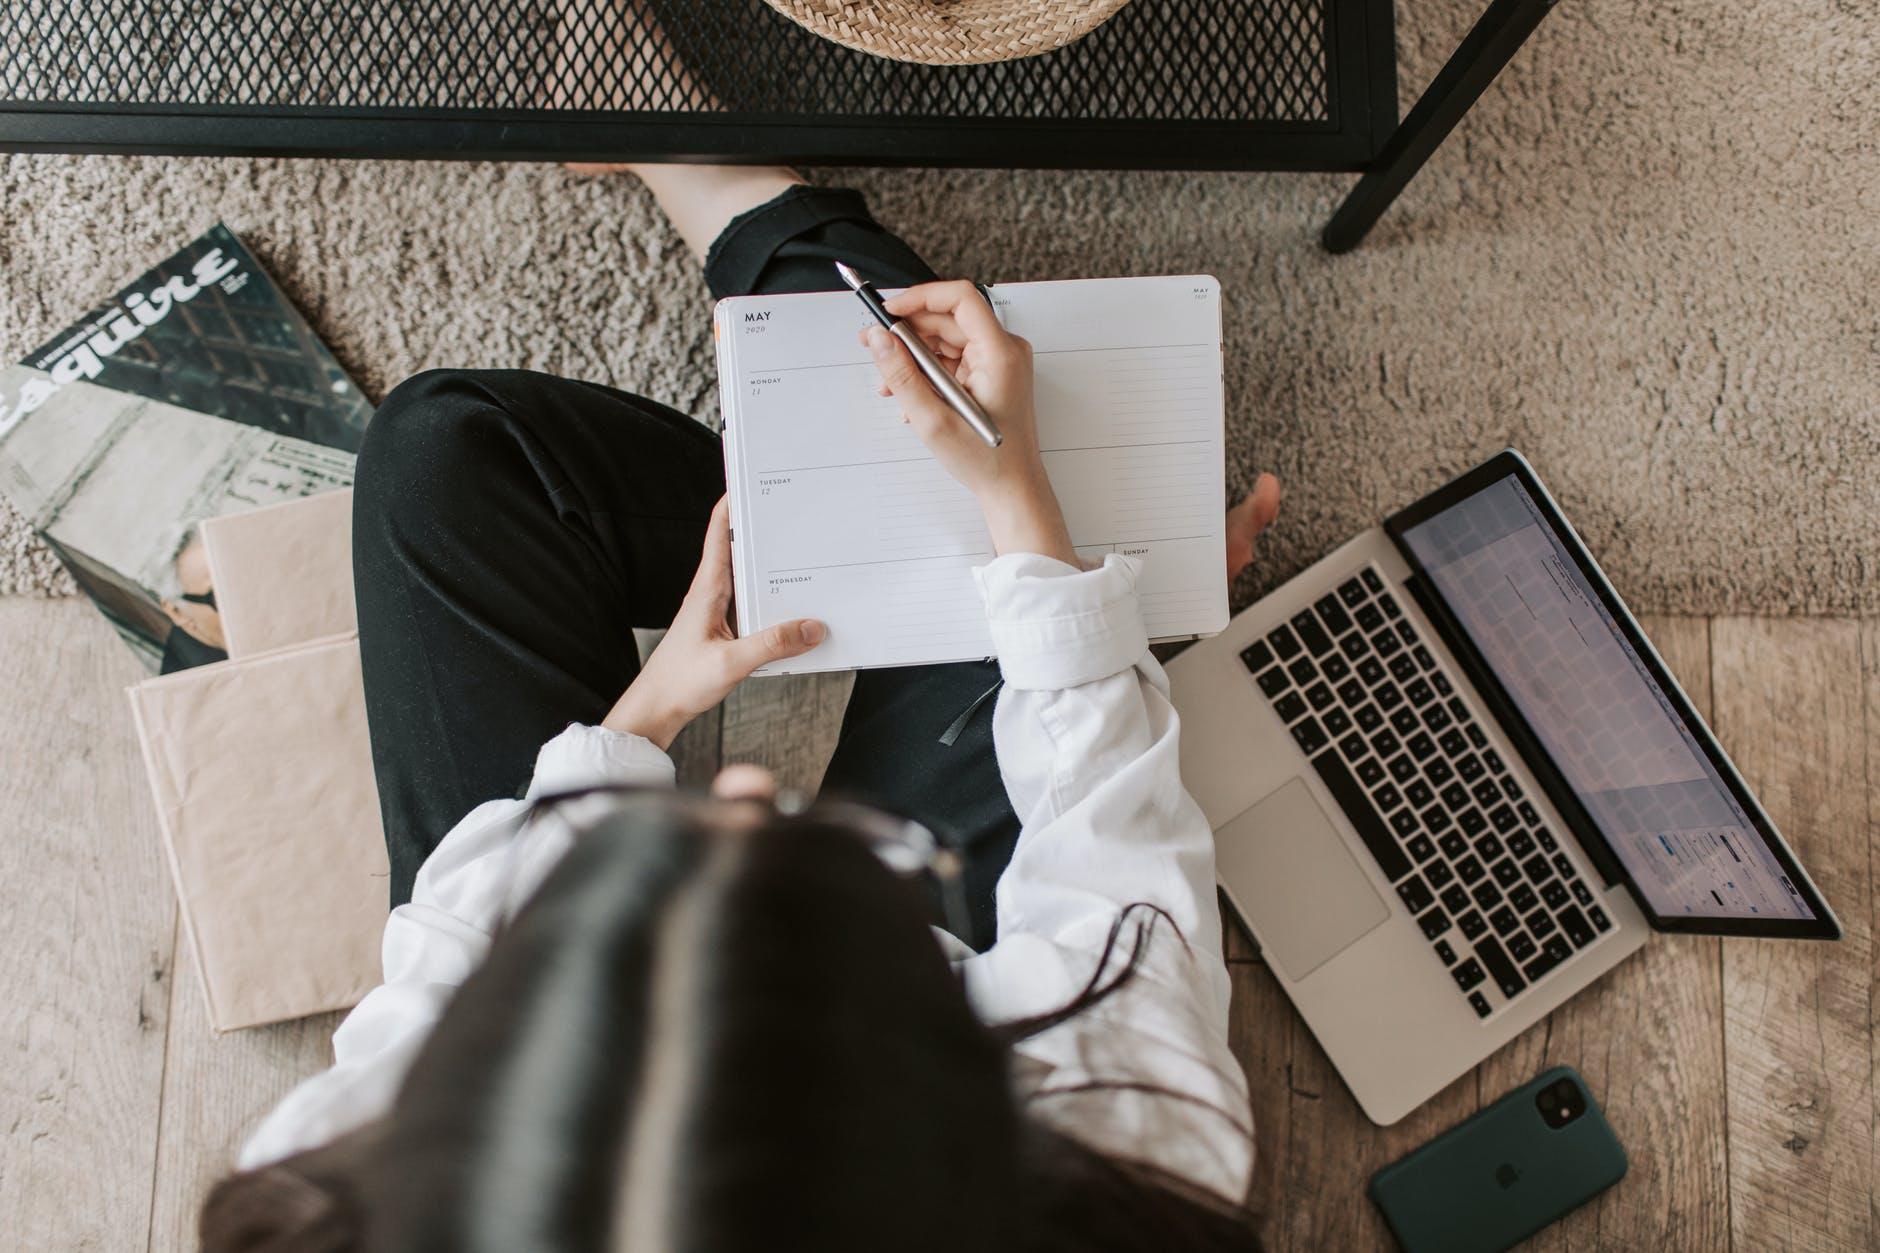 femme agenda ordinateur portable